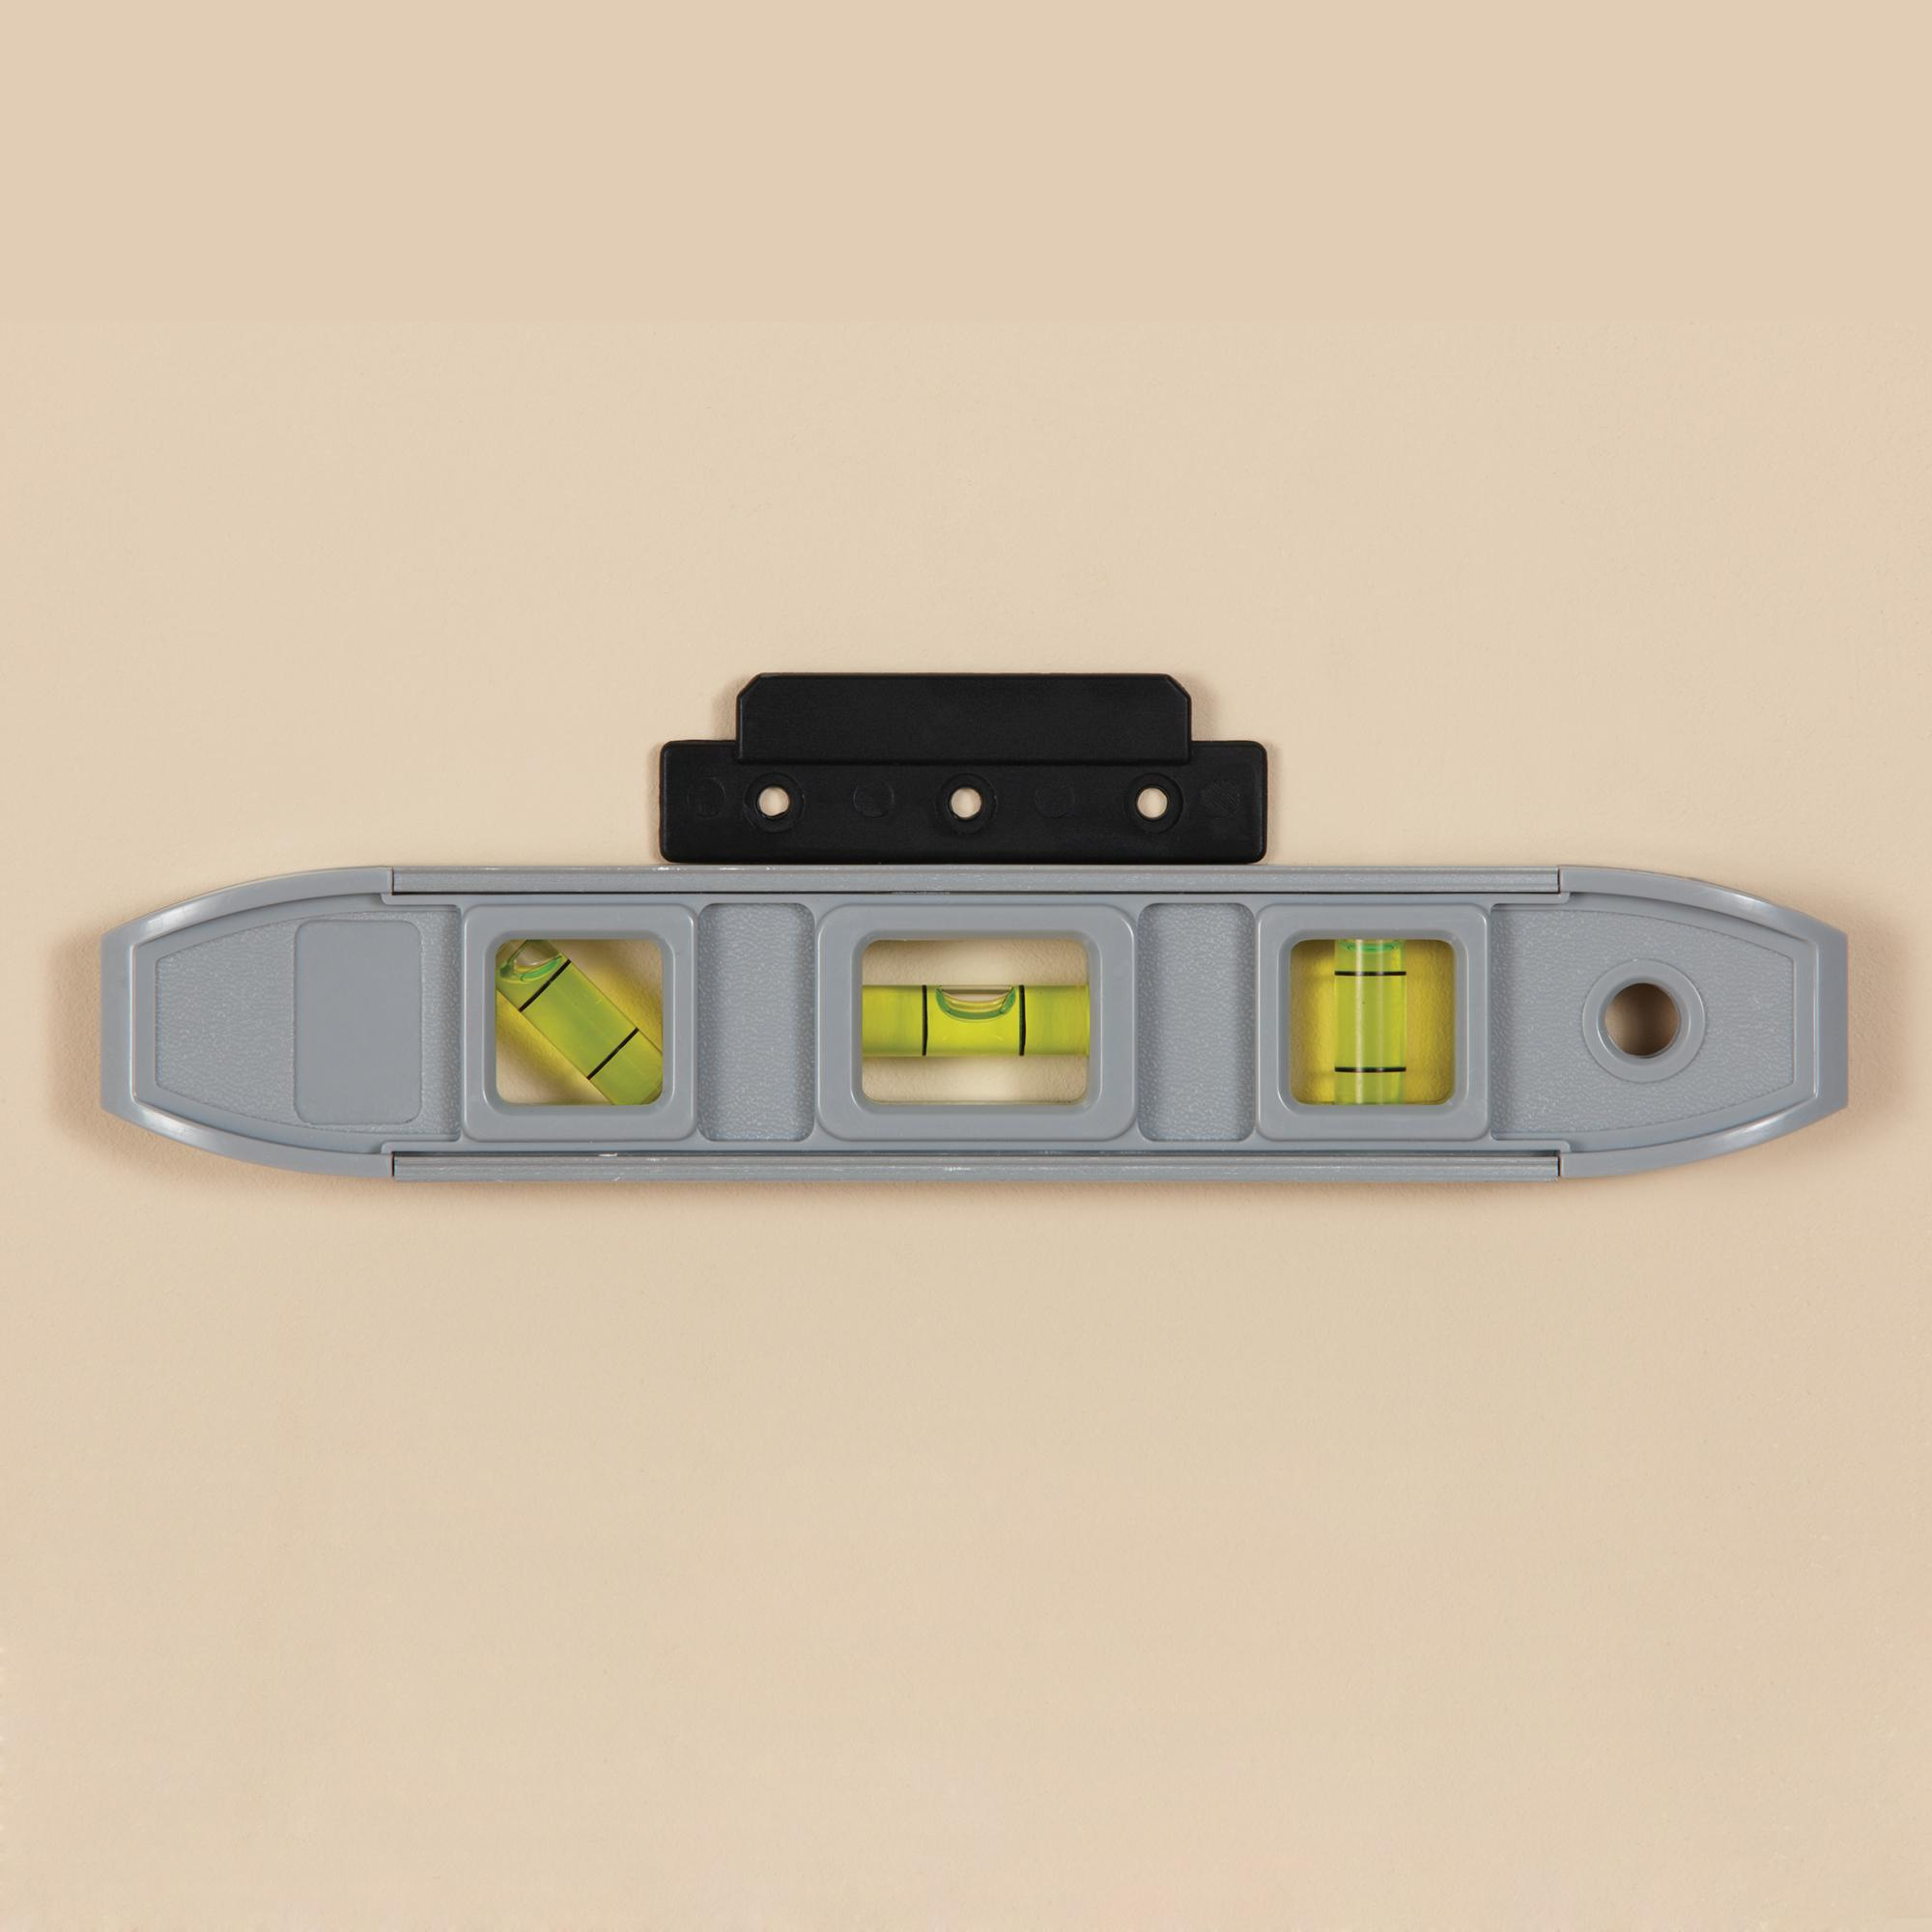 Amazon.com: Viper ProScore - Espátula digital para dardos ...